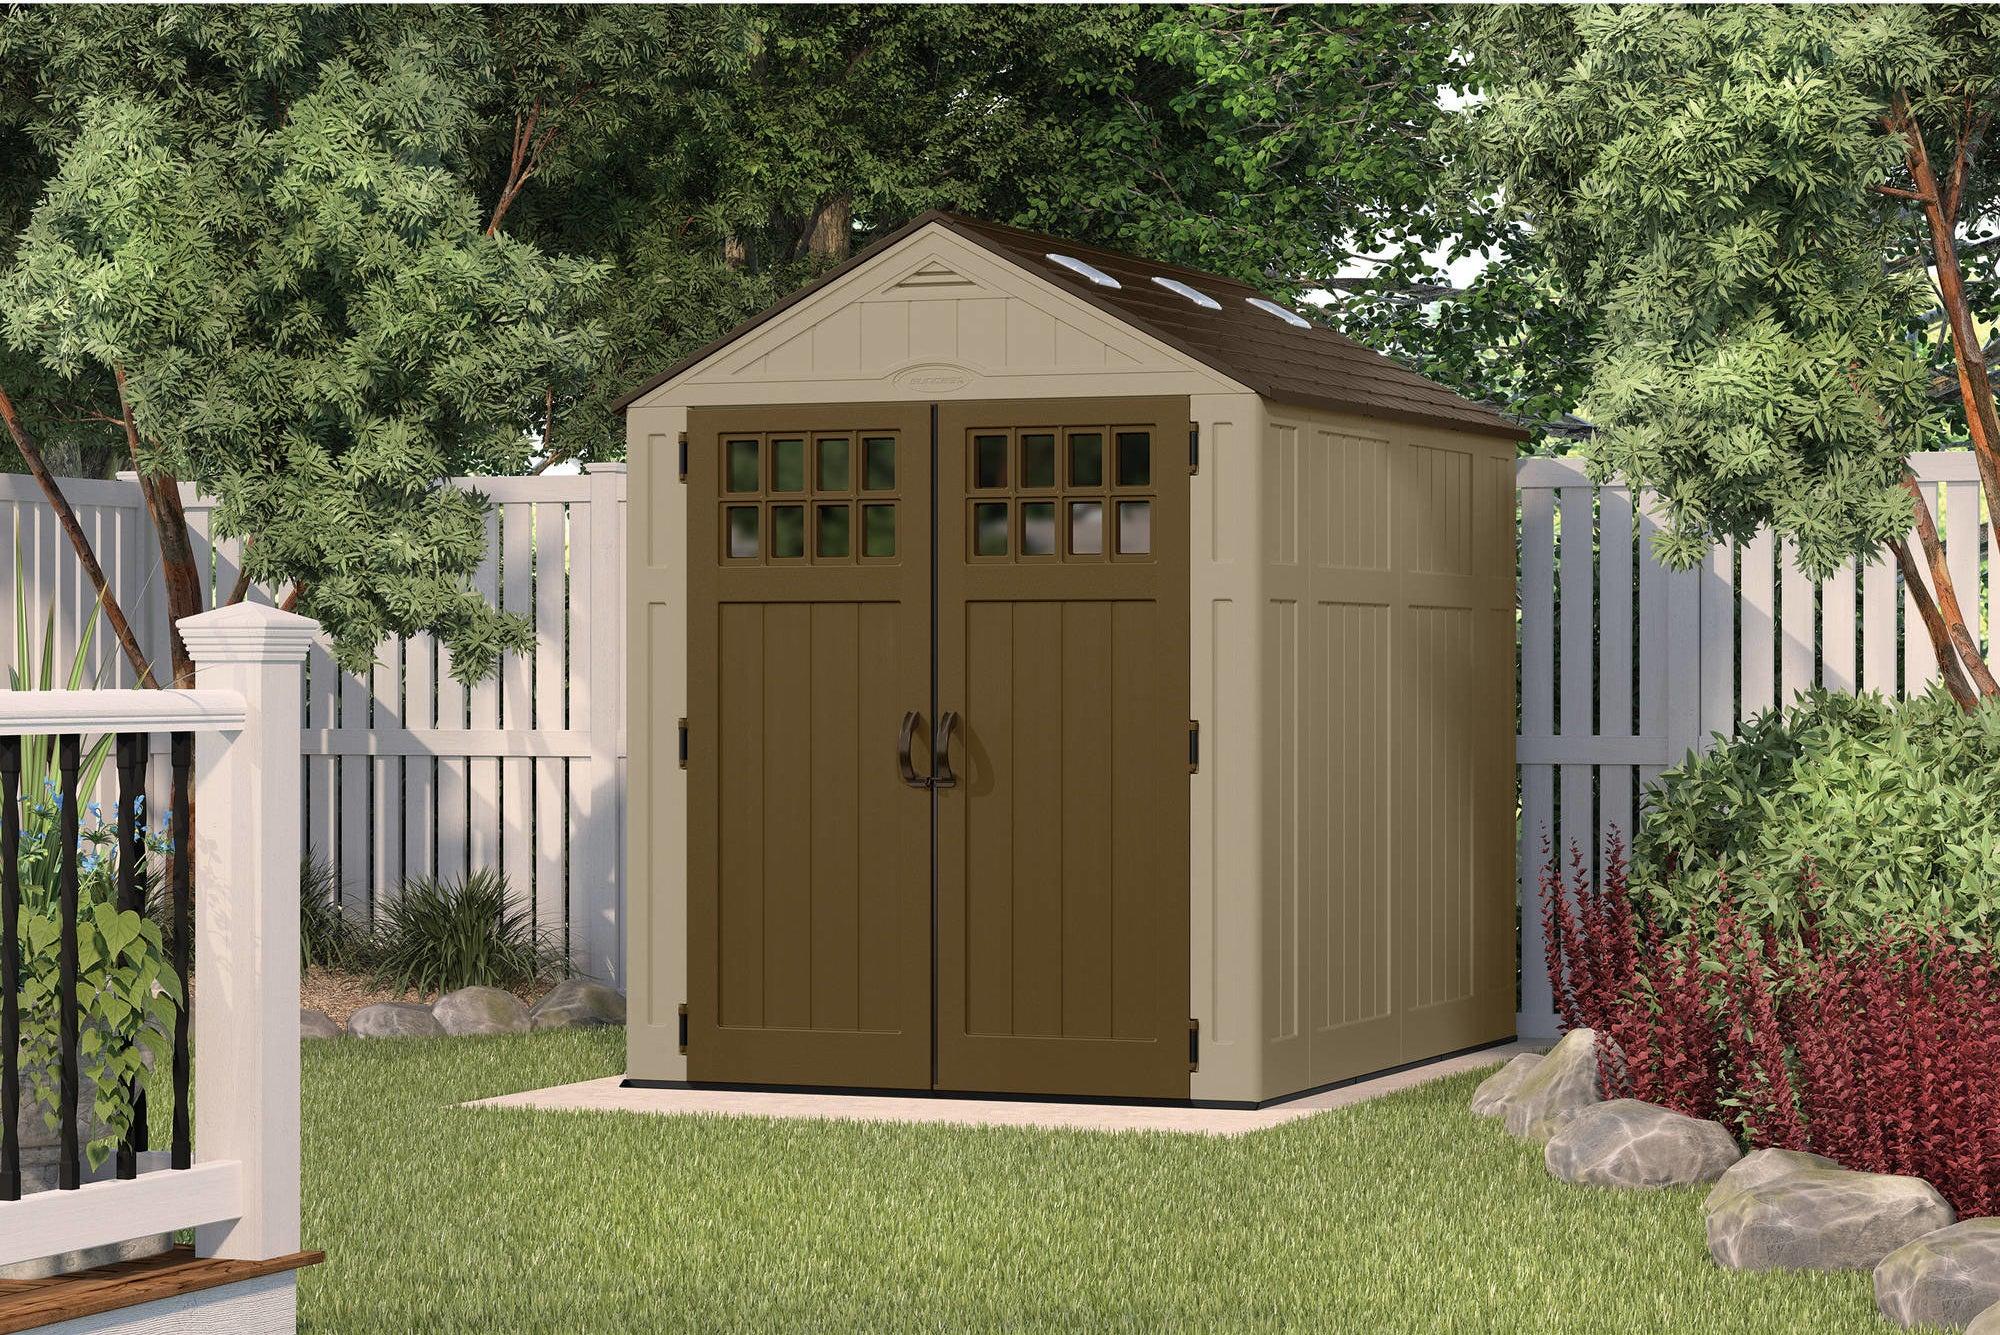 Suncast Everett backyard shed